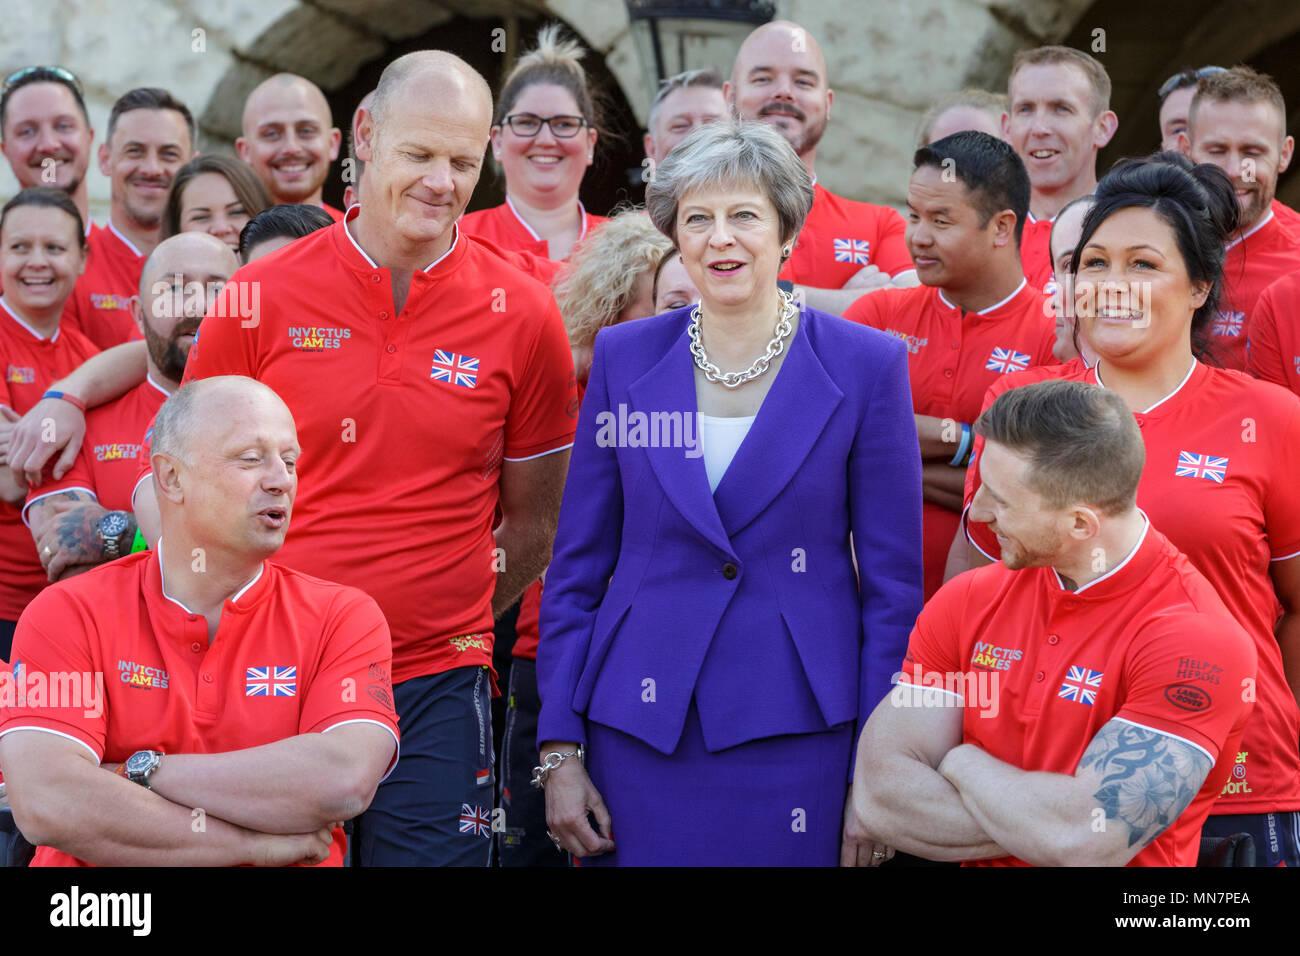 Miedoso Mens Boda Se Adapte A Reino Unido Ideas Ornamento ...